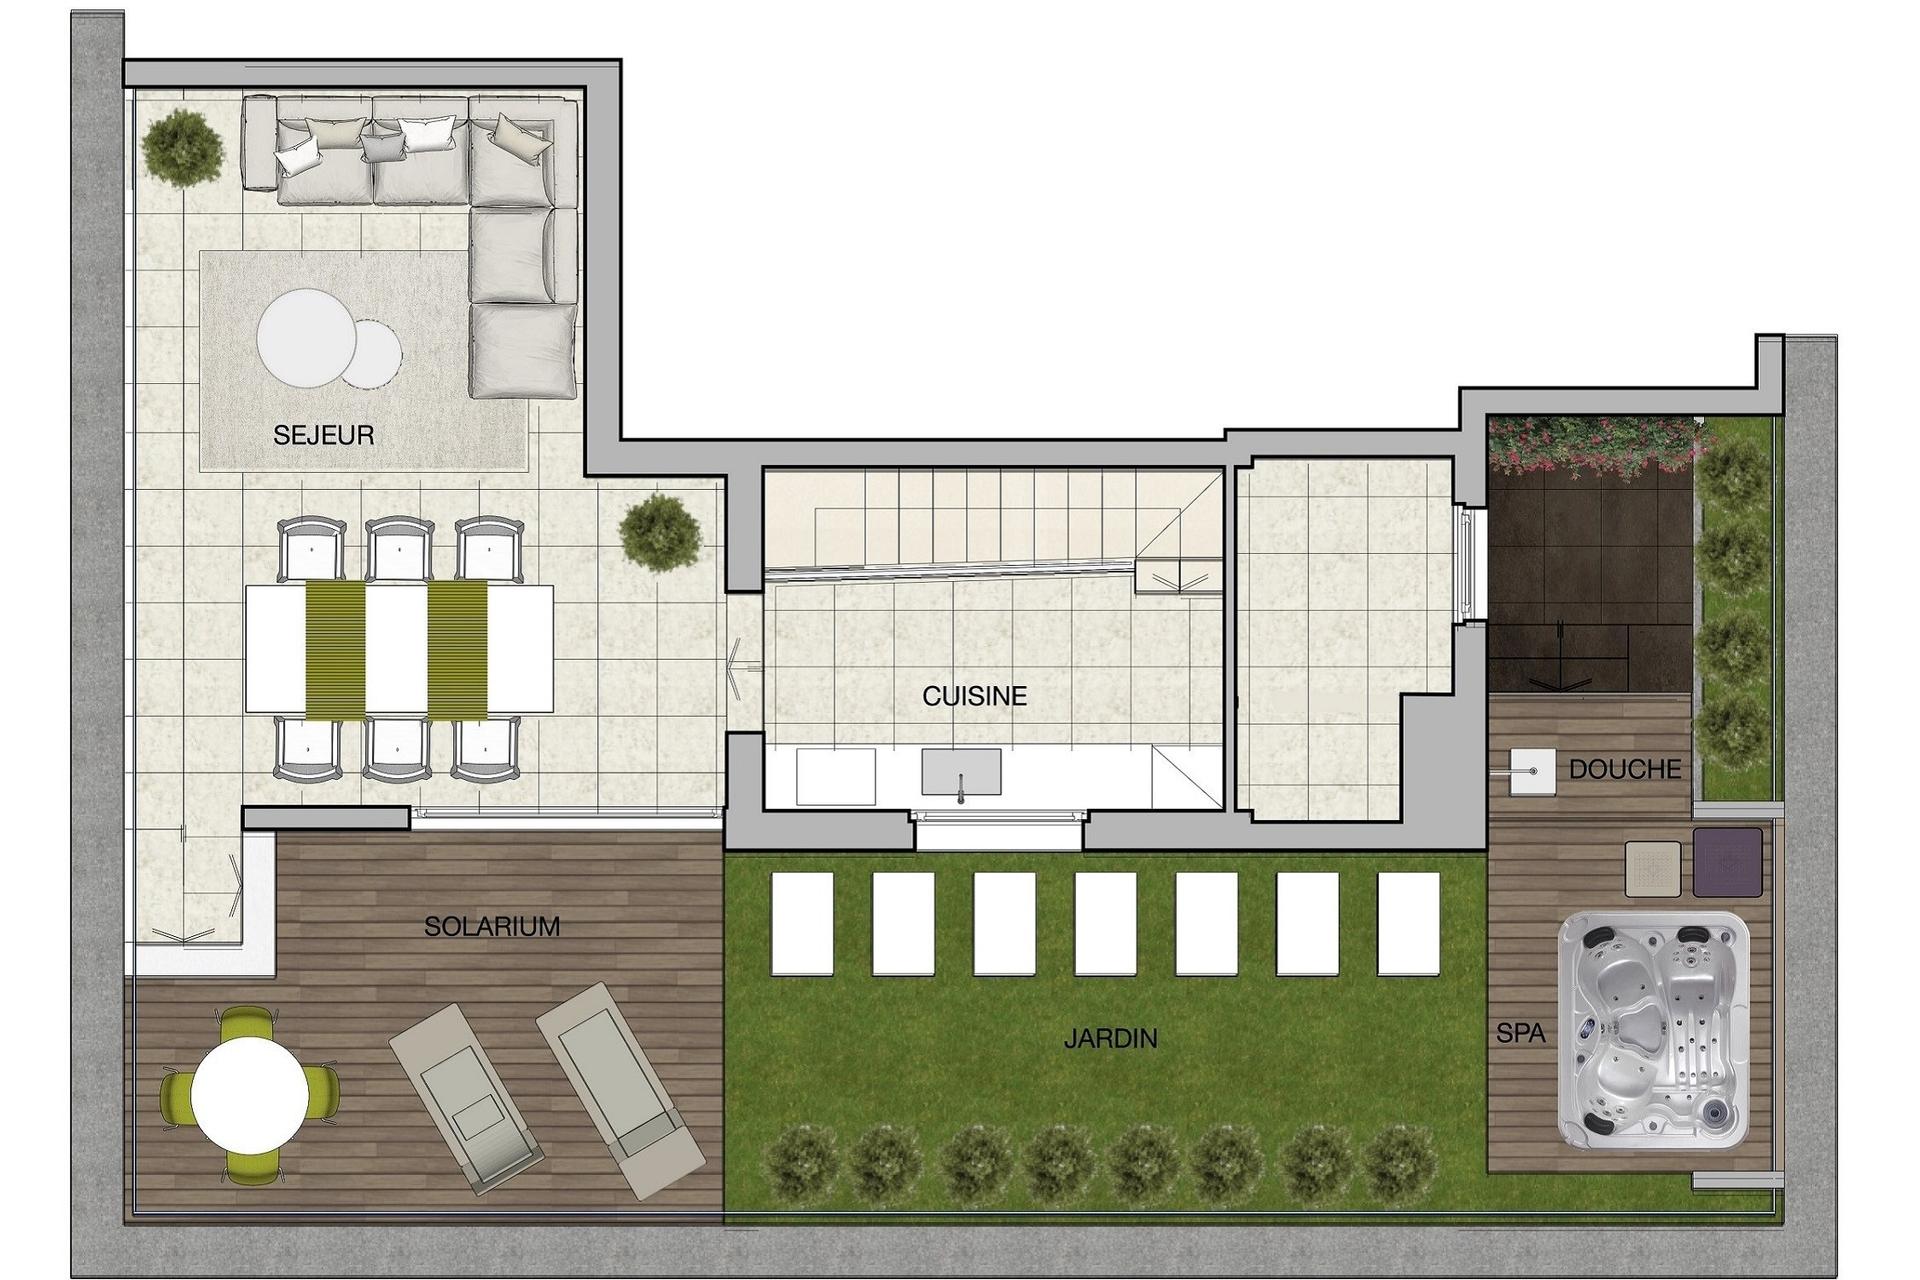 vente penthouse port hercule grand prix formule 1. Black Bedroom Furniture Sets. Home Design Ideas